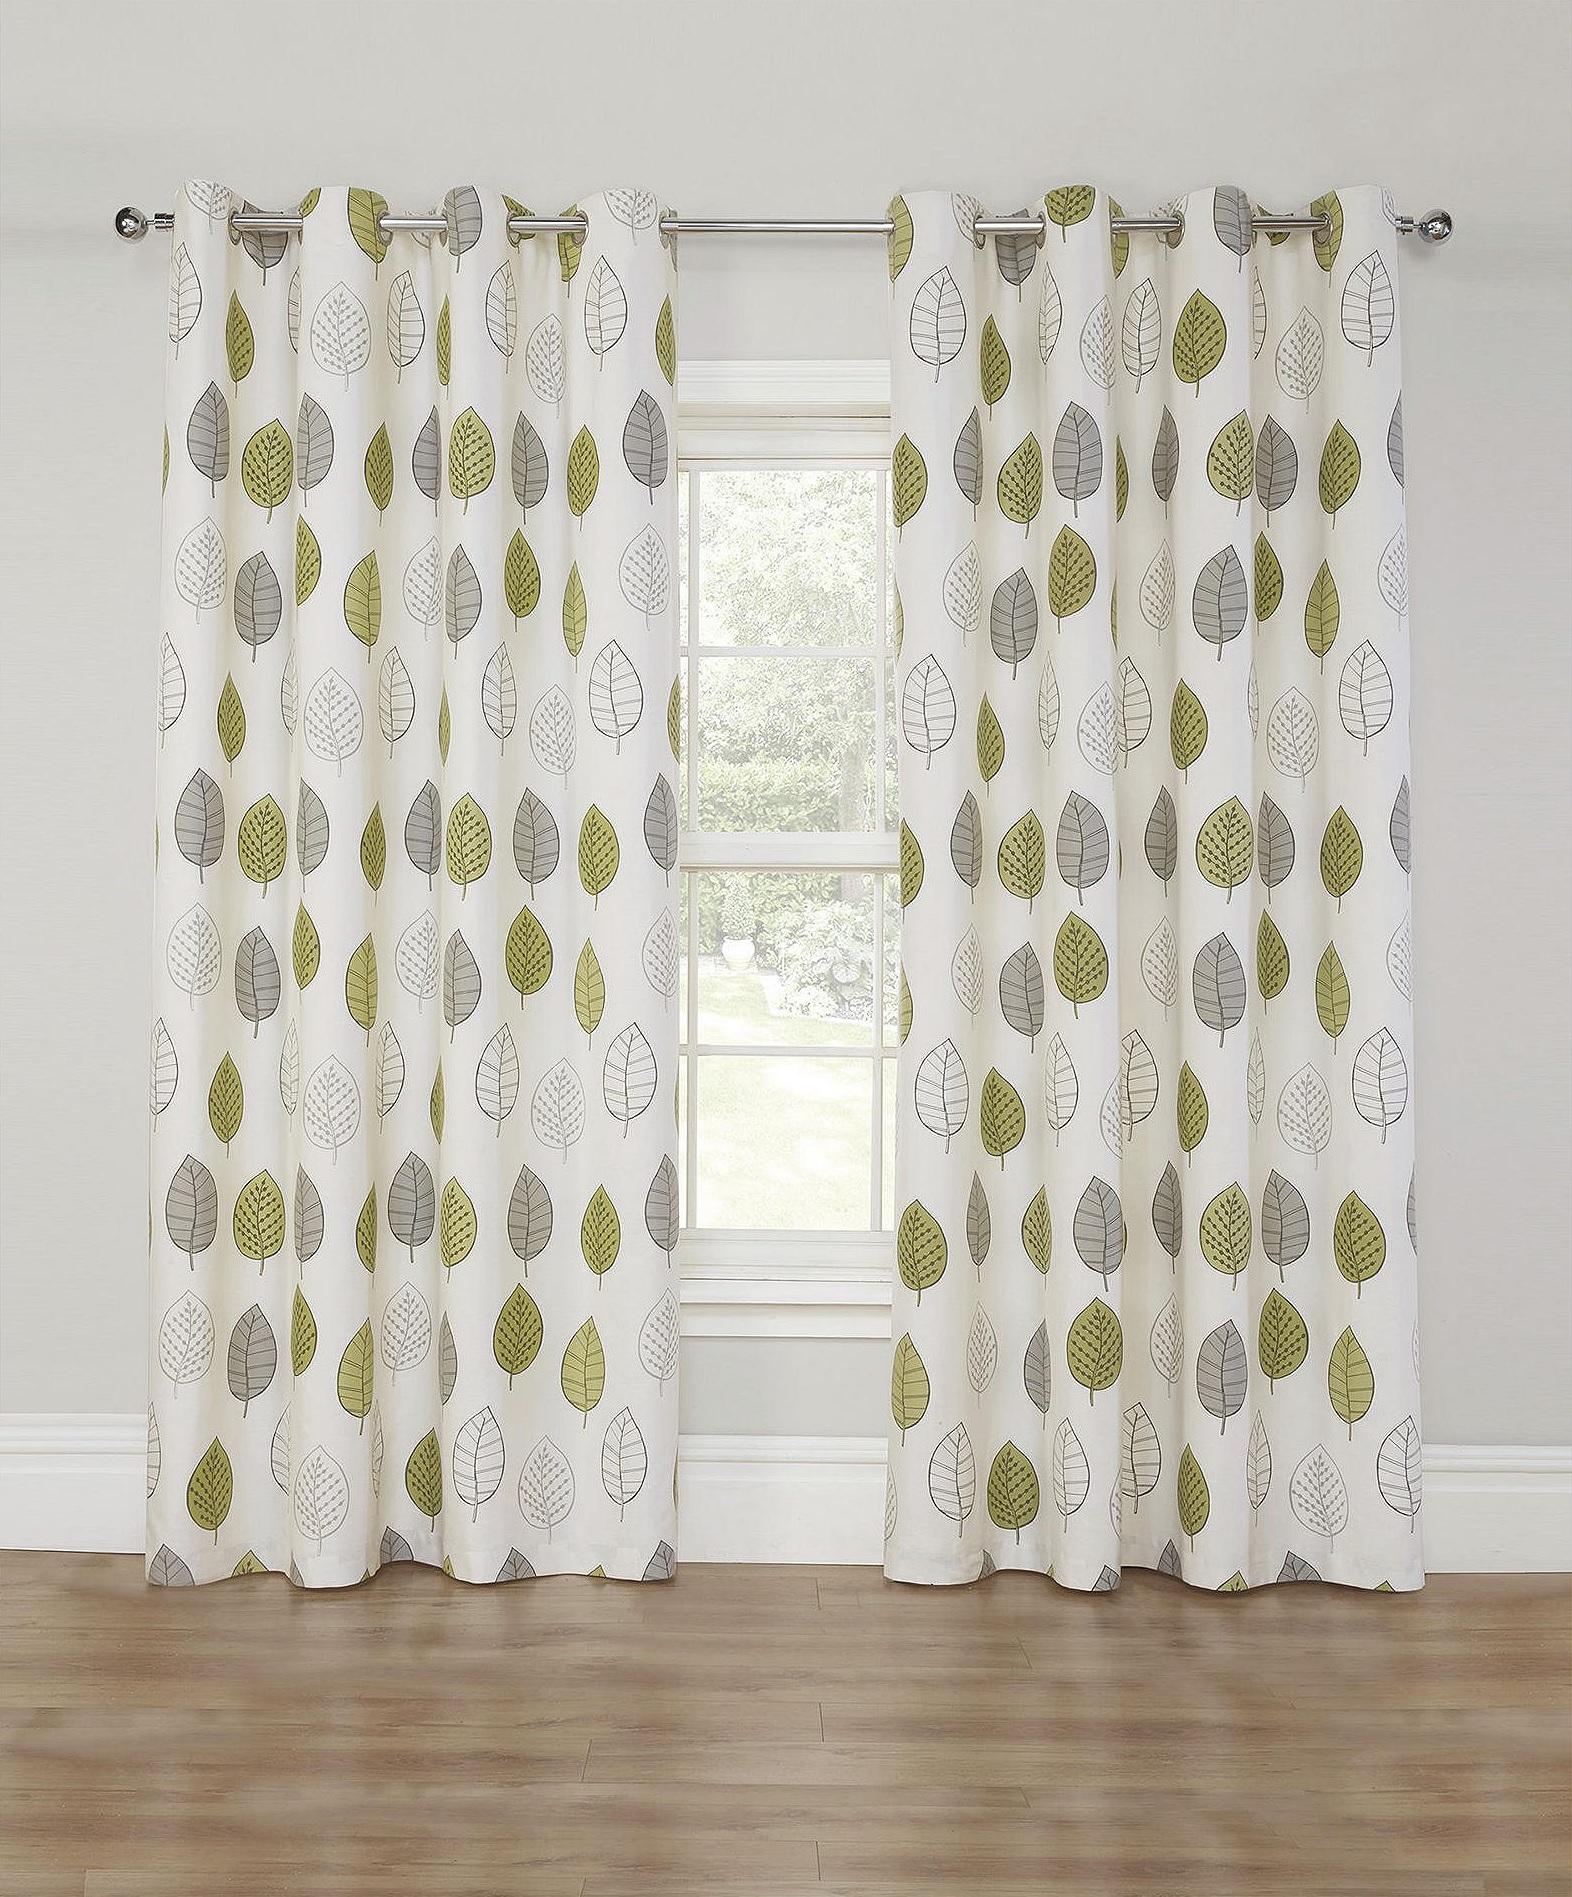 Leaf print curtains